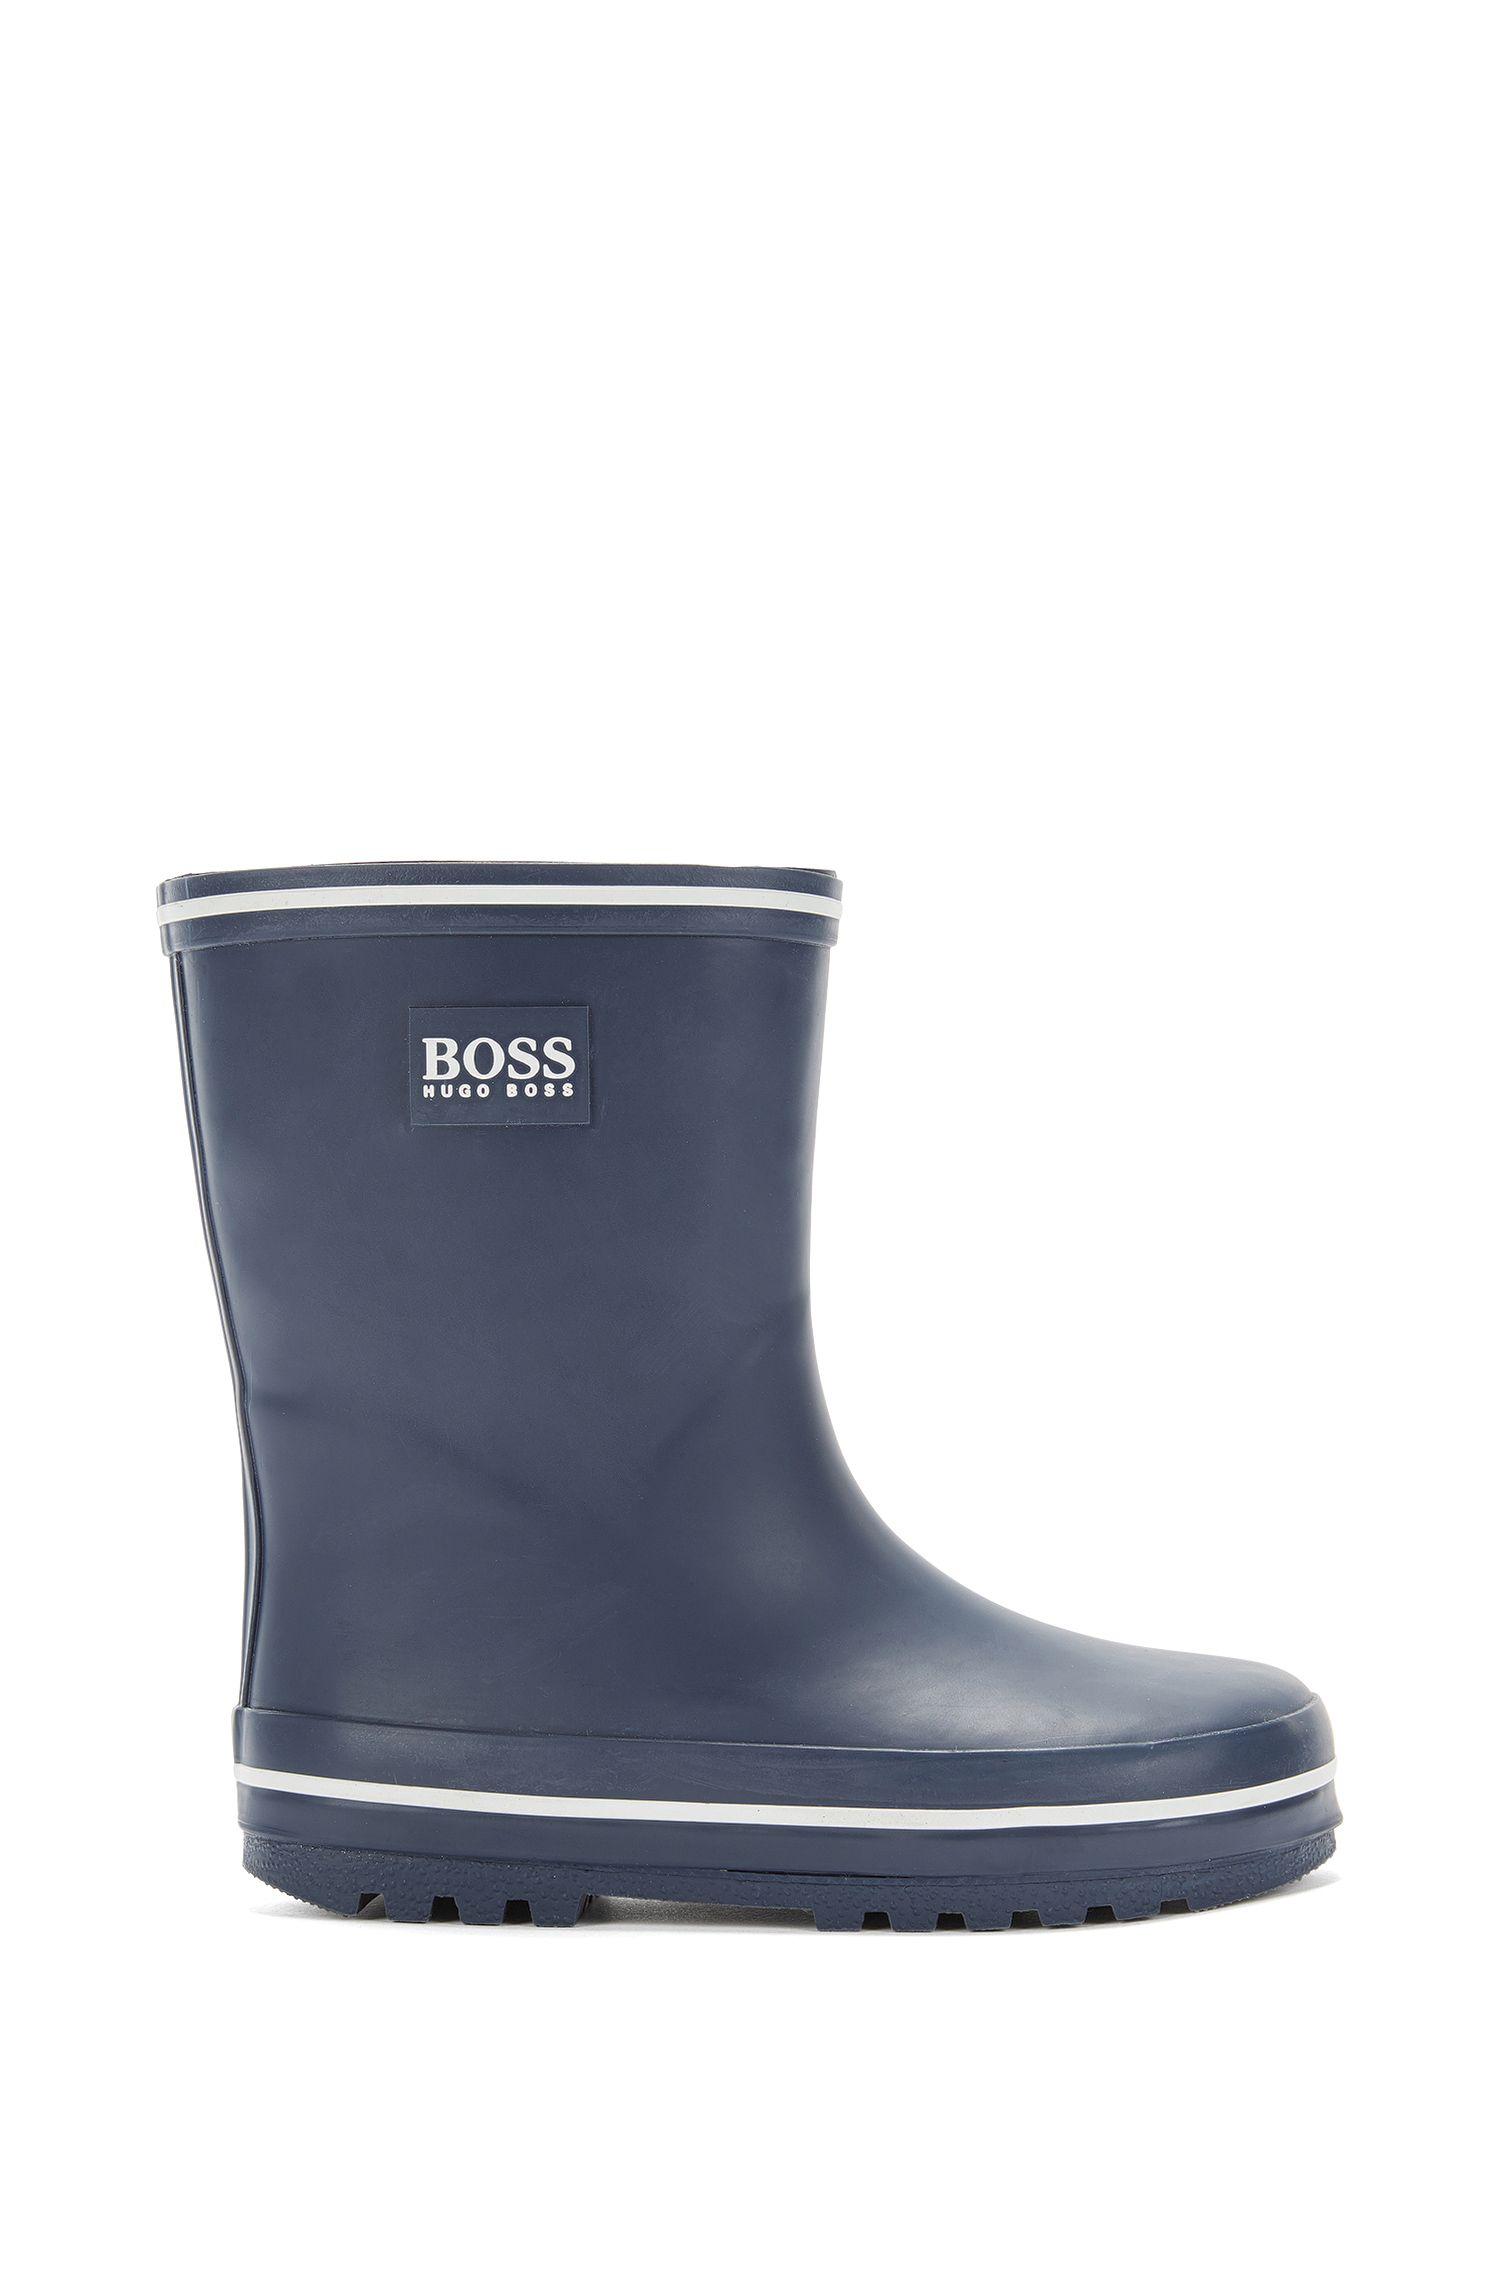 Kids' wellington boots in rubber